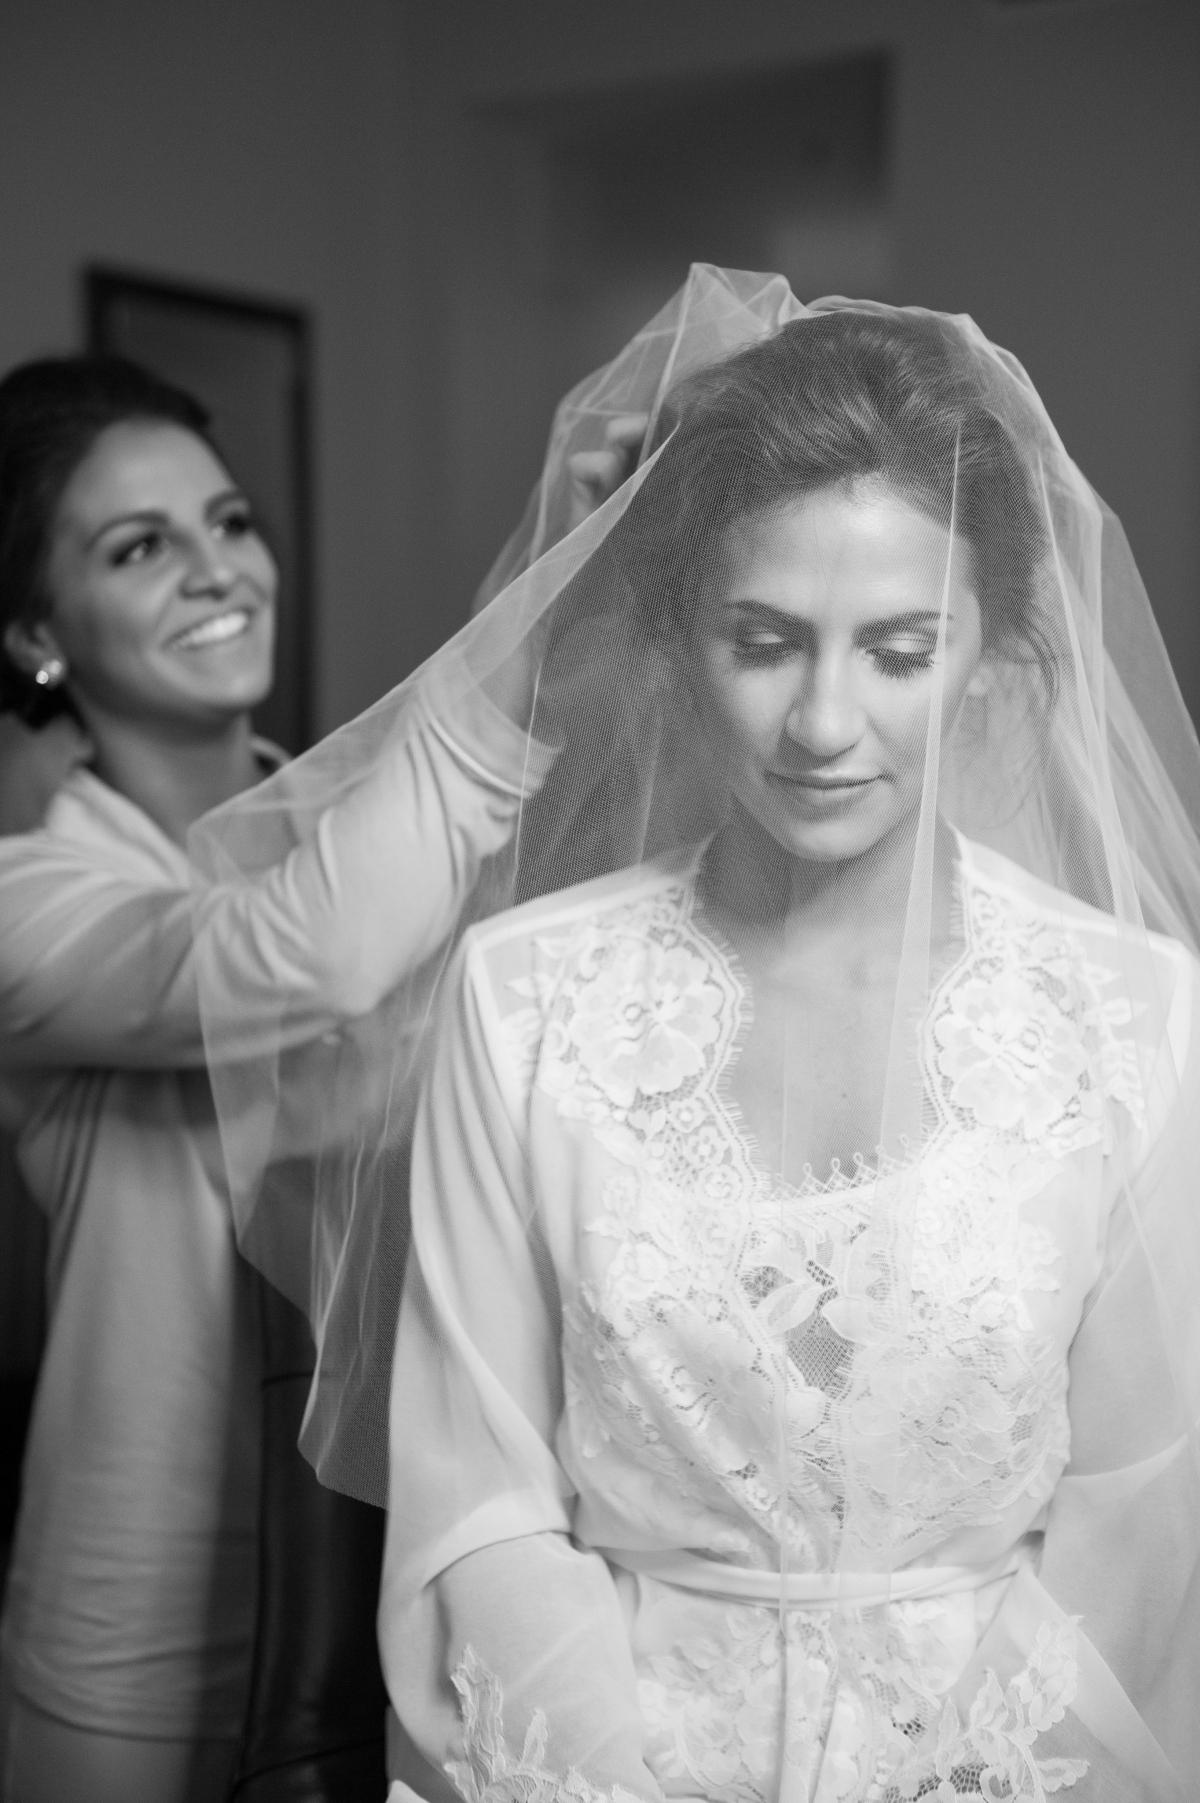 Samantha: Bridal Beauty, Health, and WellnessConsultant